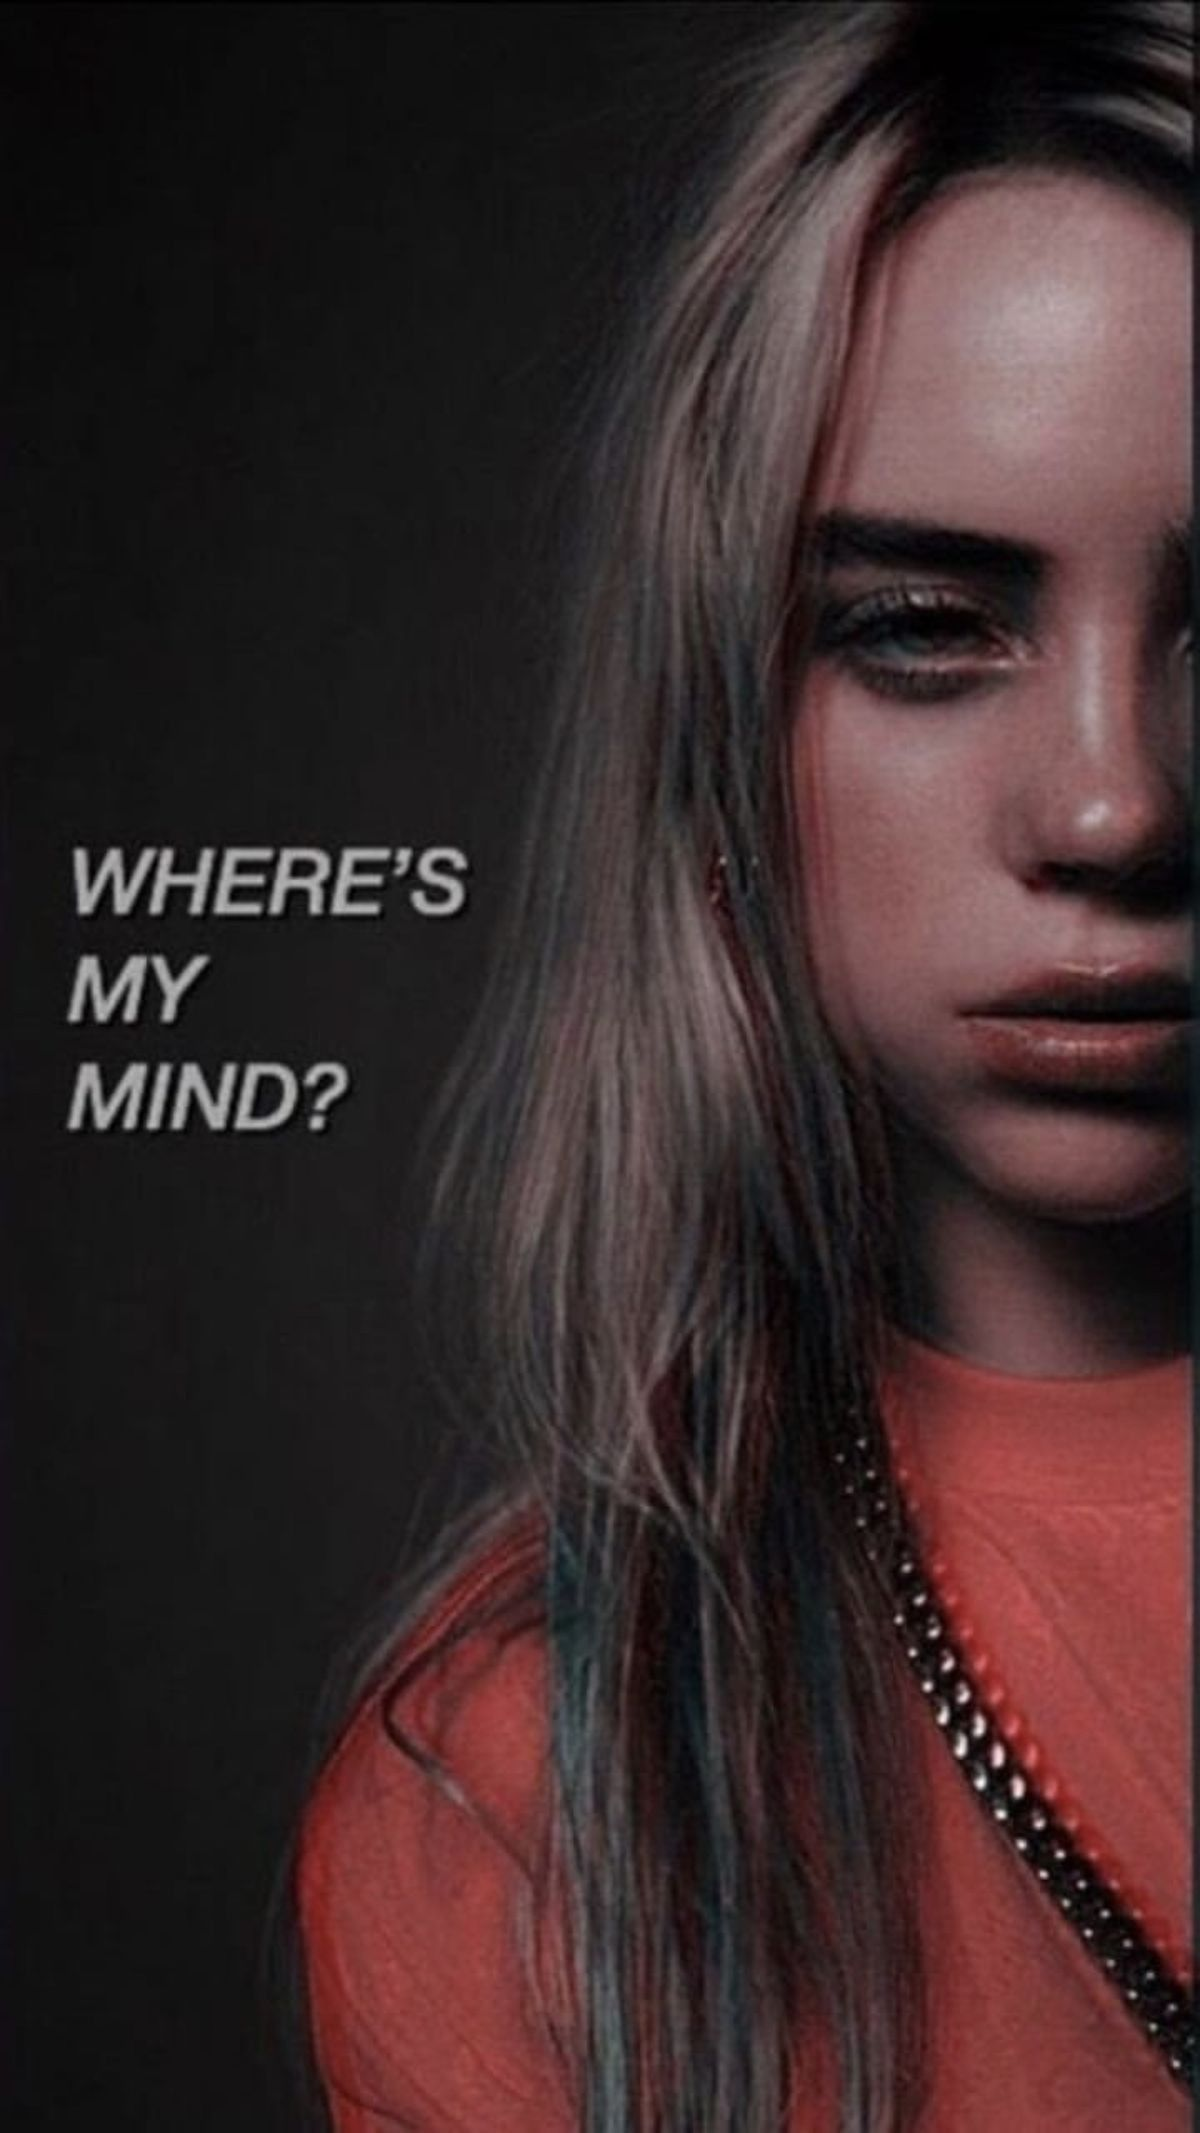 Billie Eilish 𝔴𝔞𝔩𝔩𝔭𝔞𝔭𝔢𝔯 Billie Eilish Billie Singer